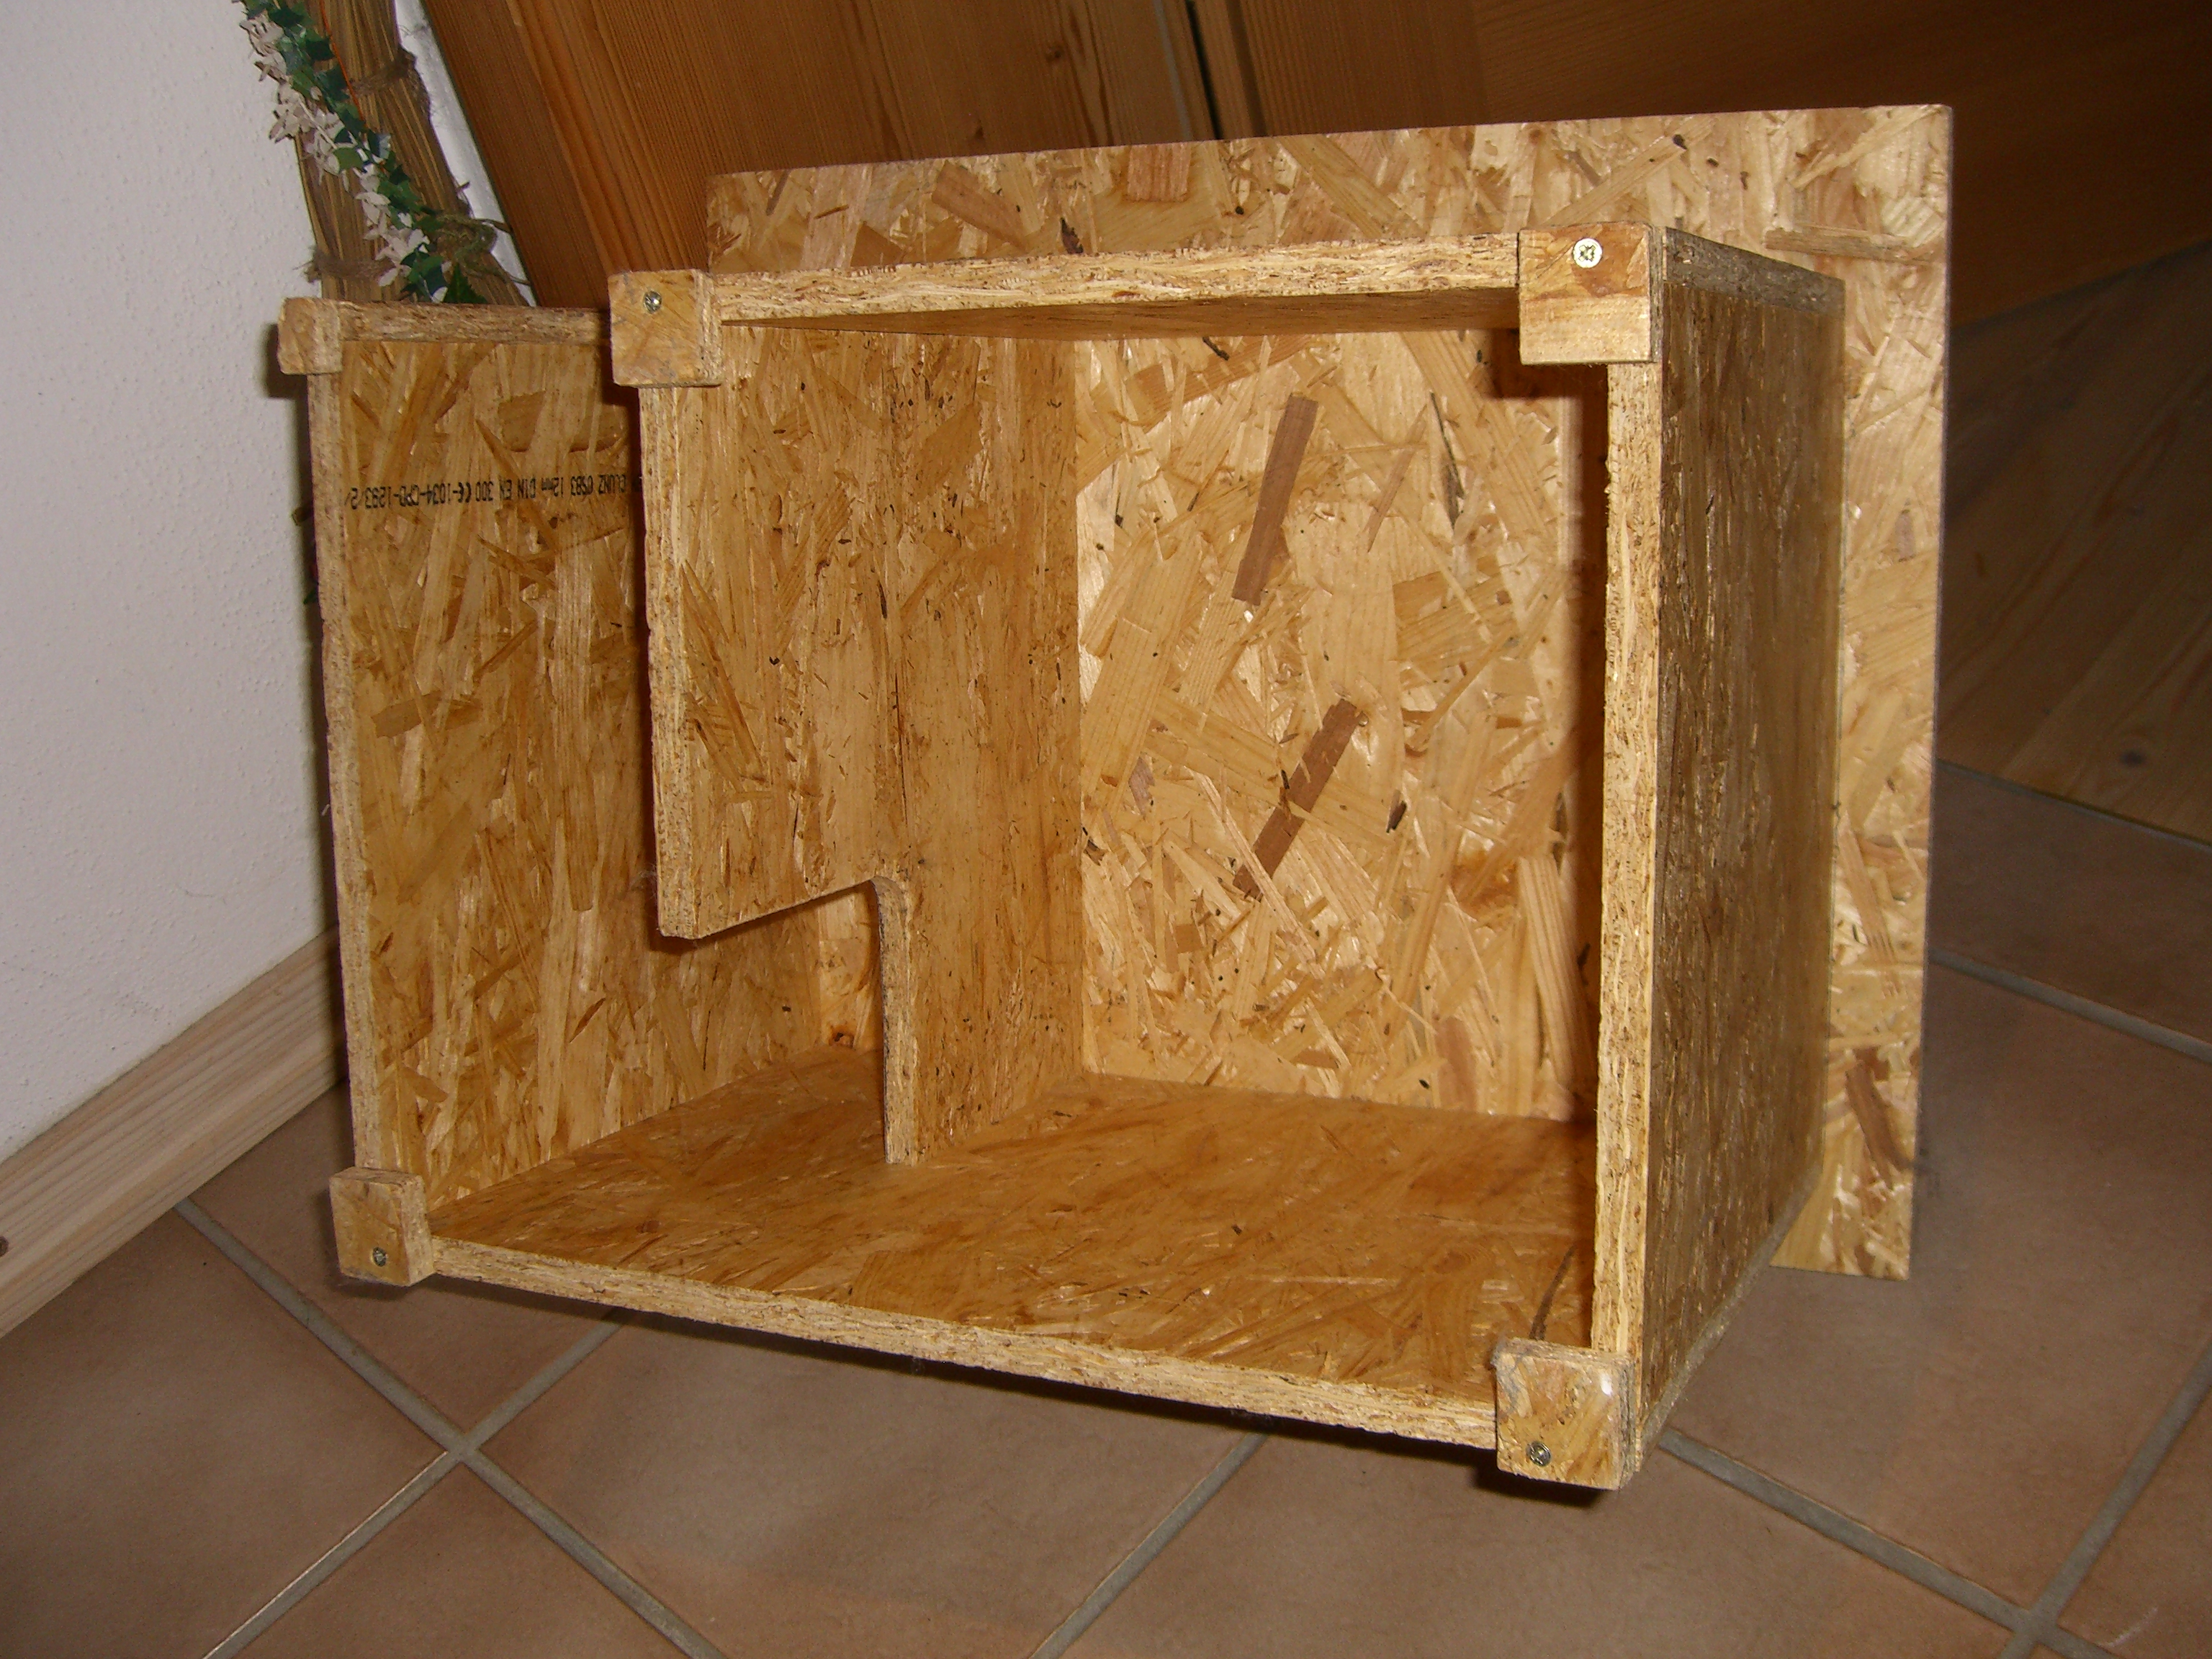 igel schlaf fess haus kombiniert igelstation weilheim. Black Bedroom Furniture Sets. Home Design Ideas